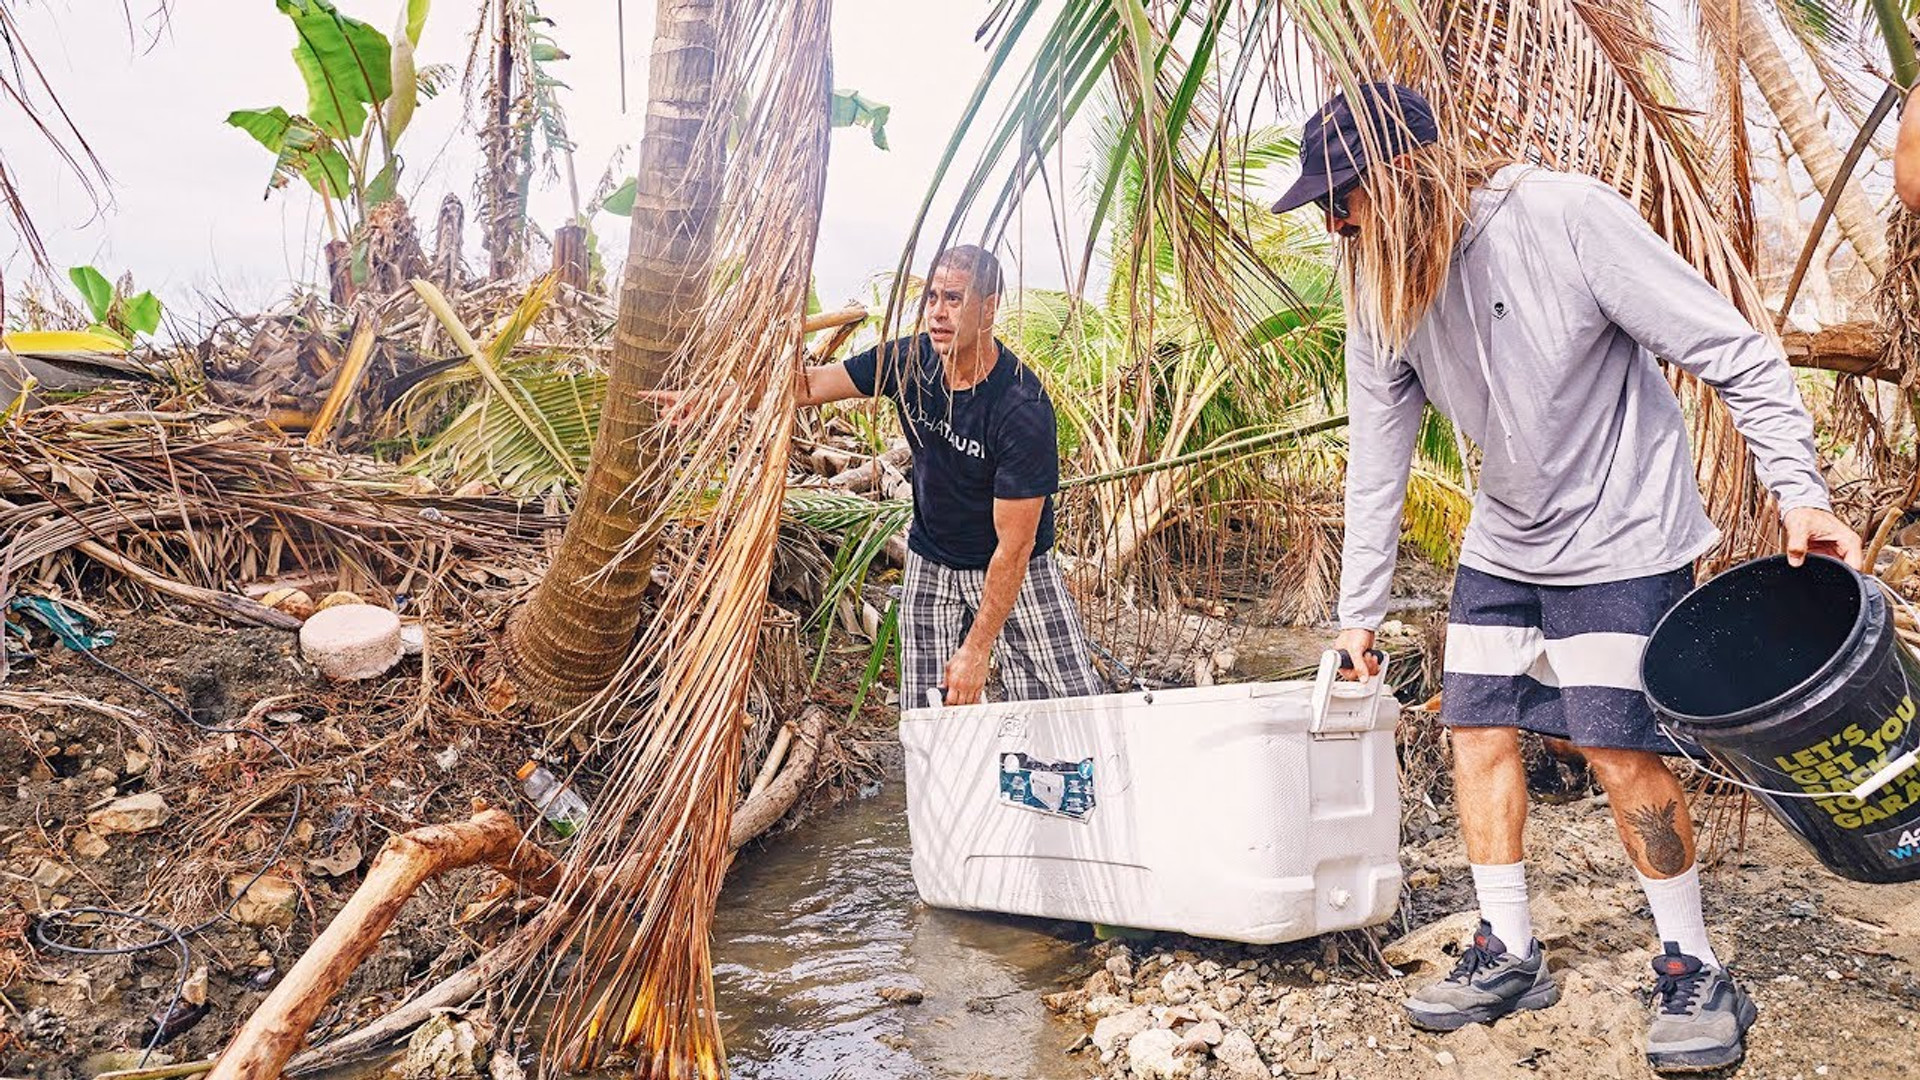 PUERTO RICO: HURRICANE MARIA - RELIEF EFFORTS